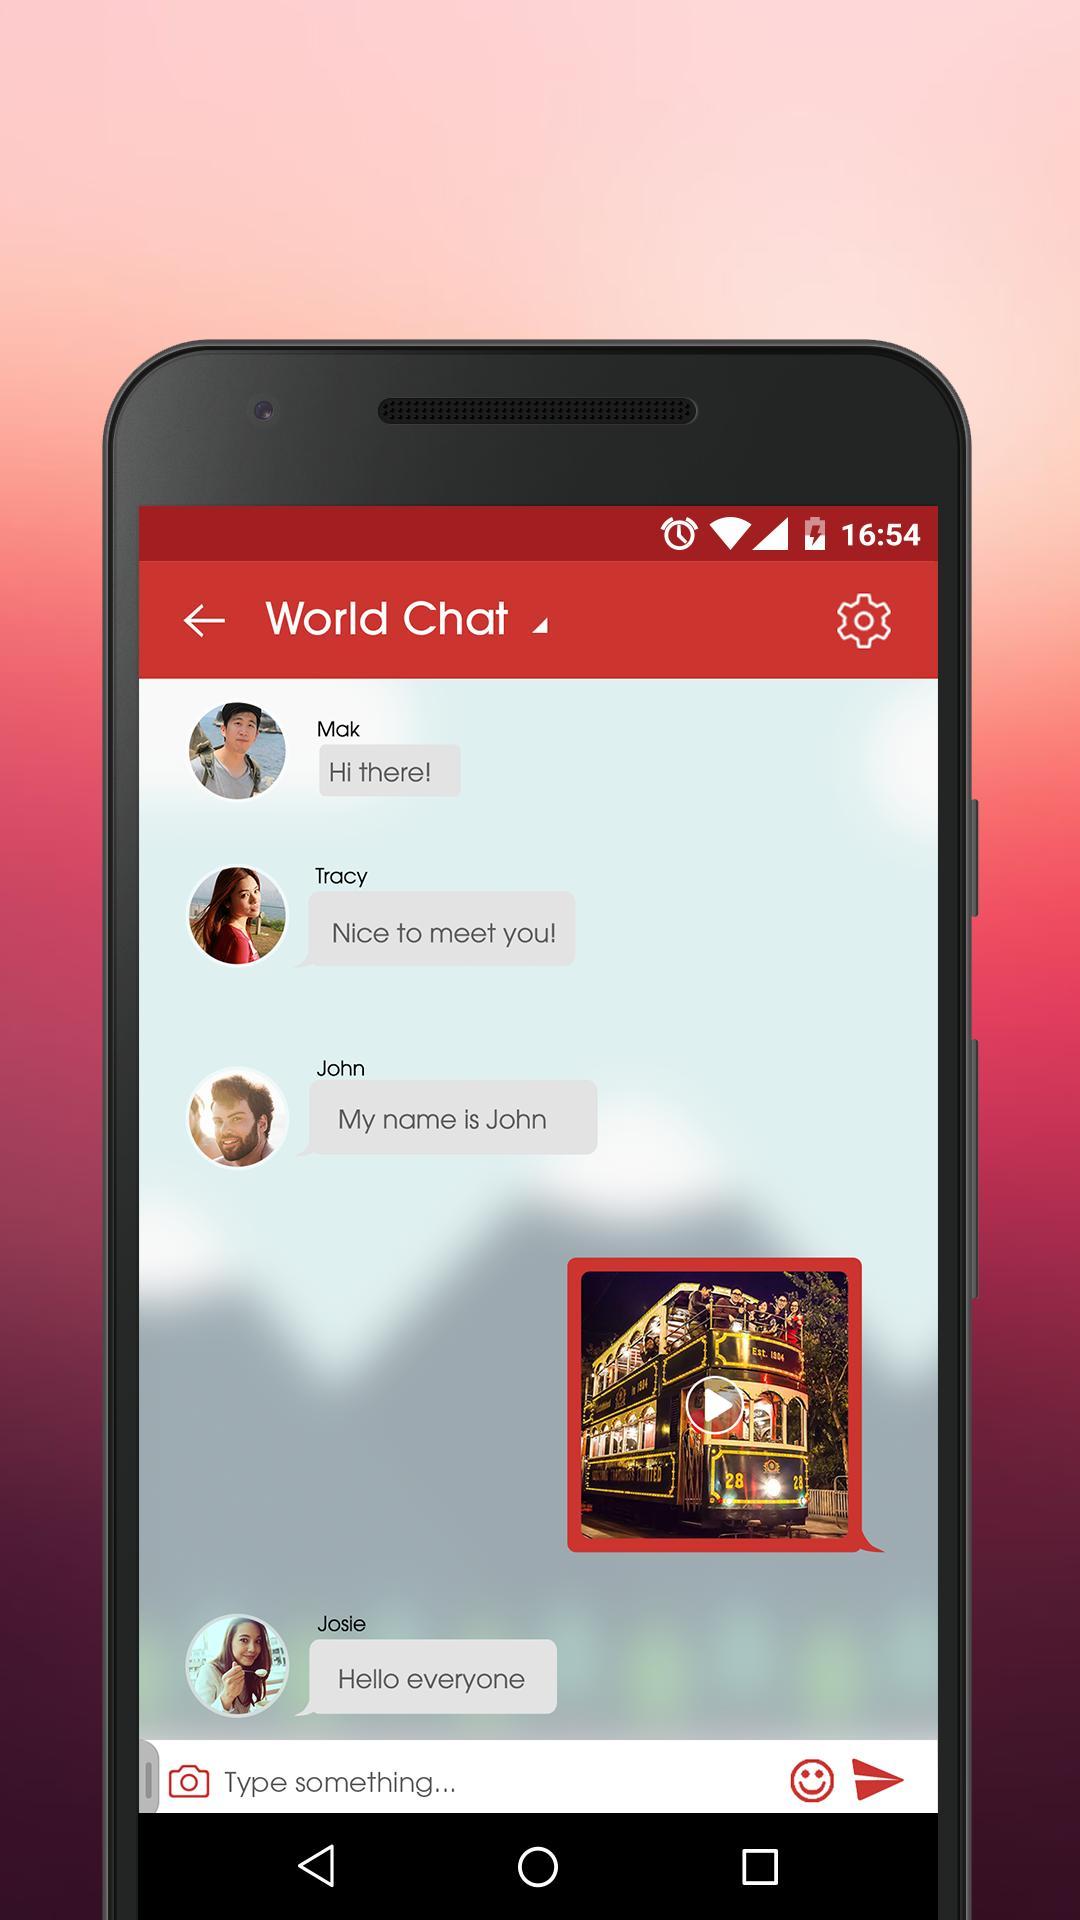 online dating hyvää huomenta tekstit